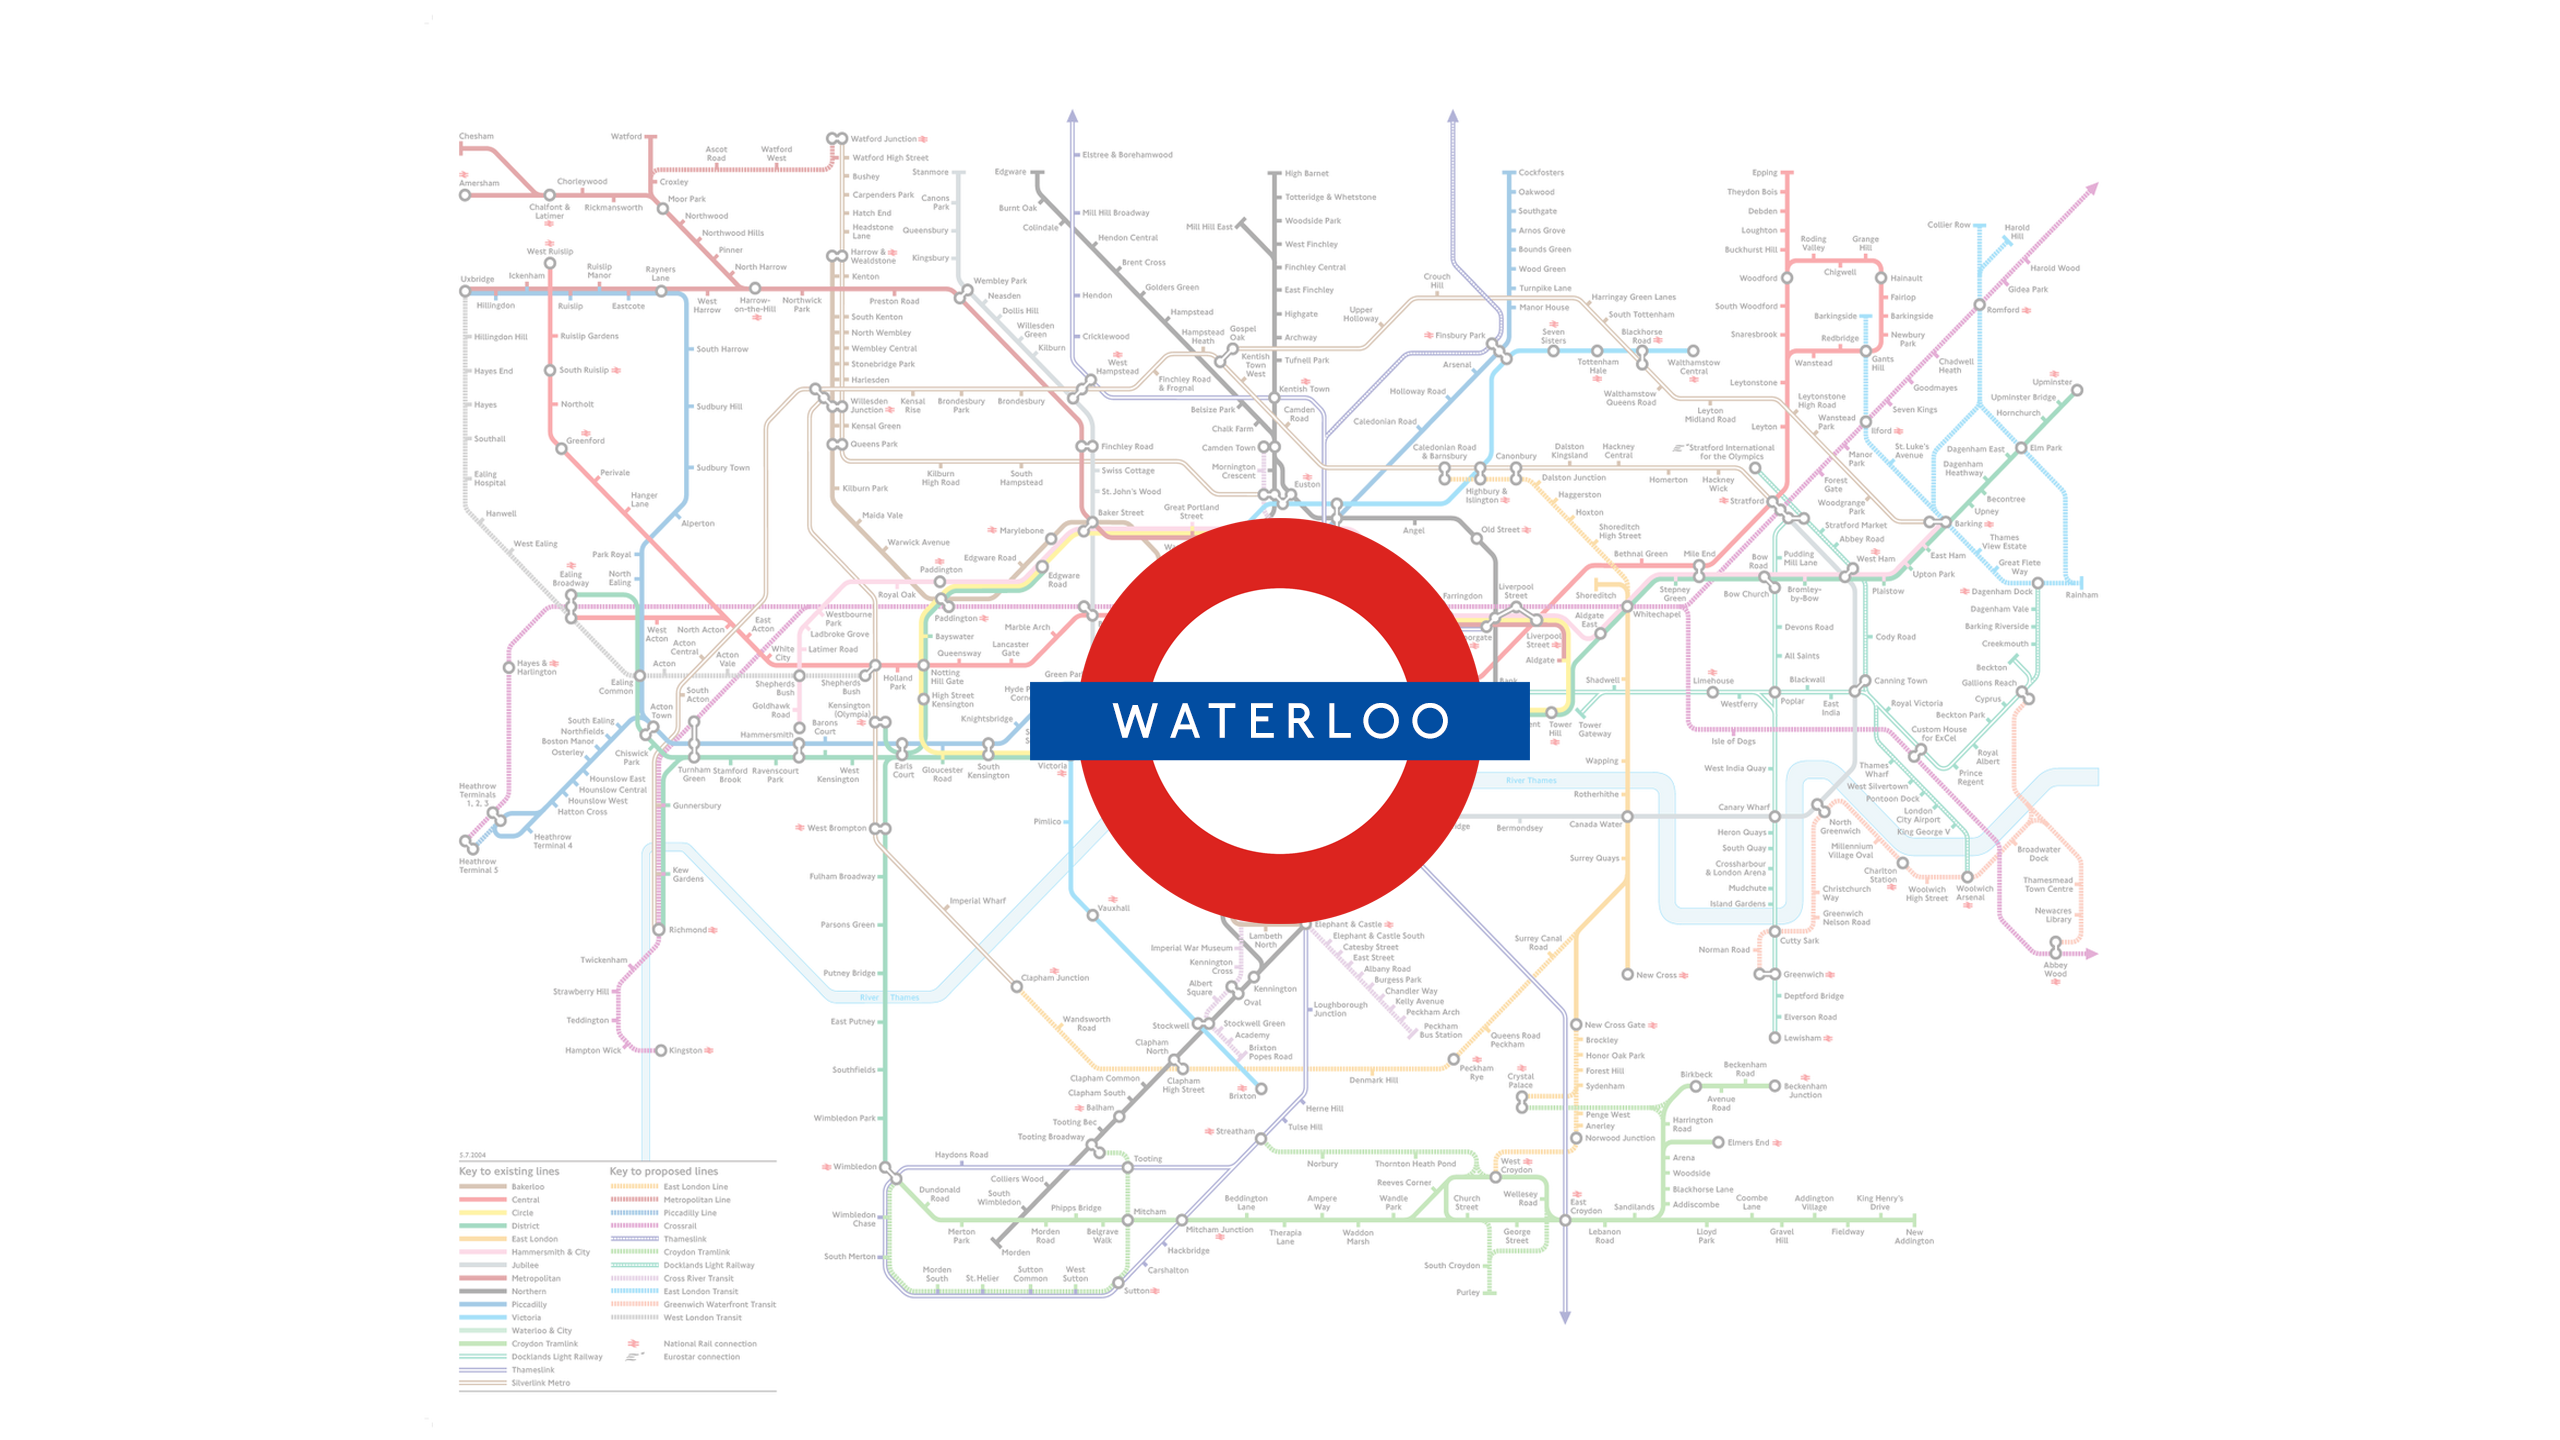 Waterloo (Map)